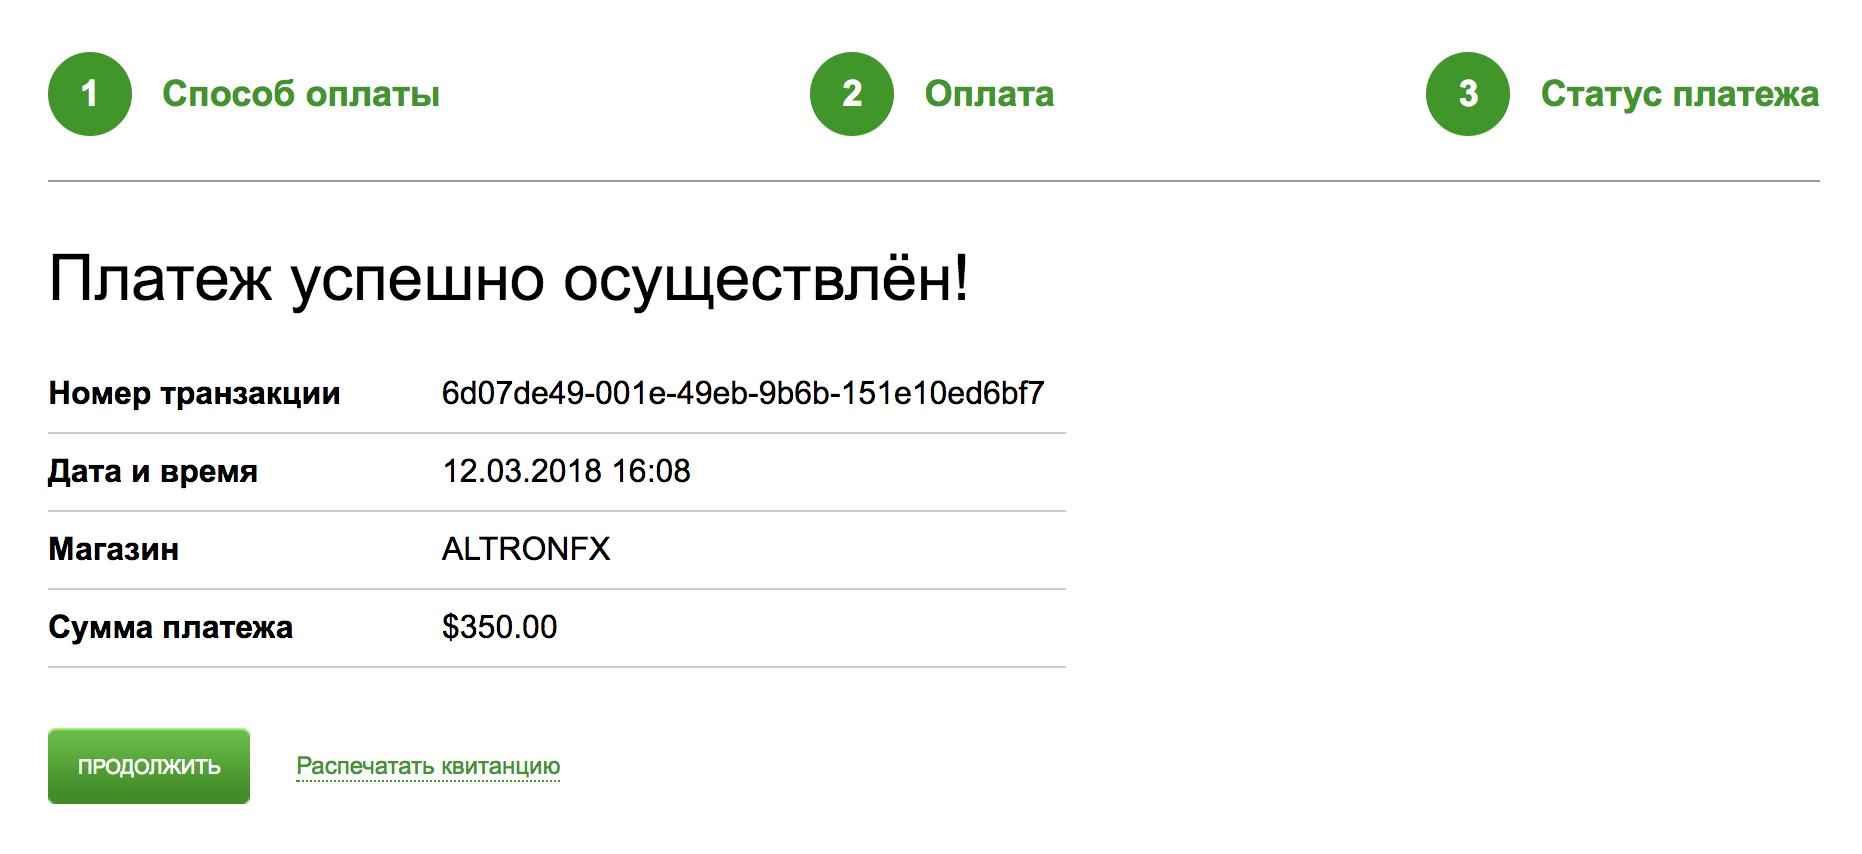 Screenshot_at_Mar_12_19_08_09.png